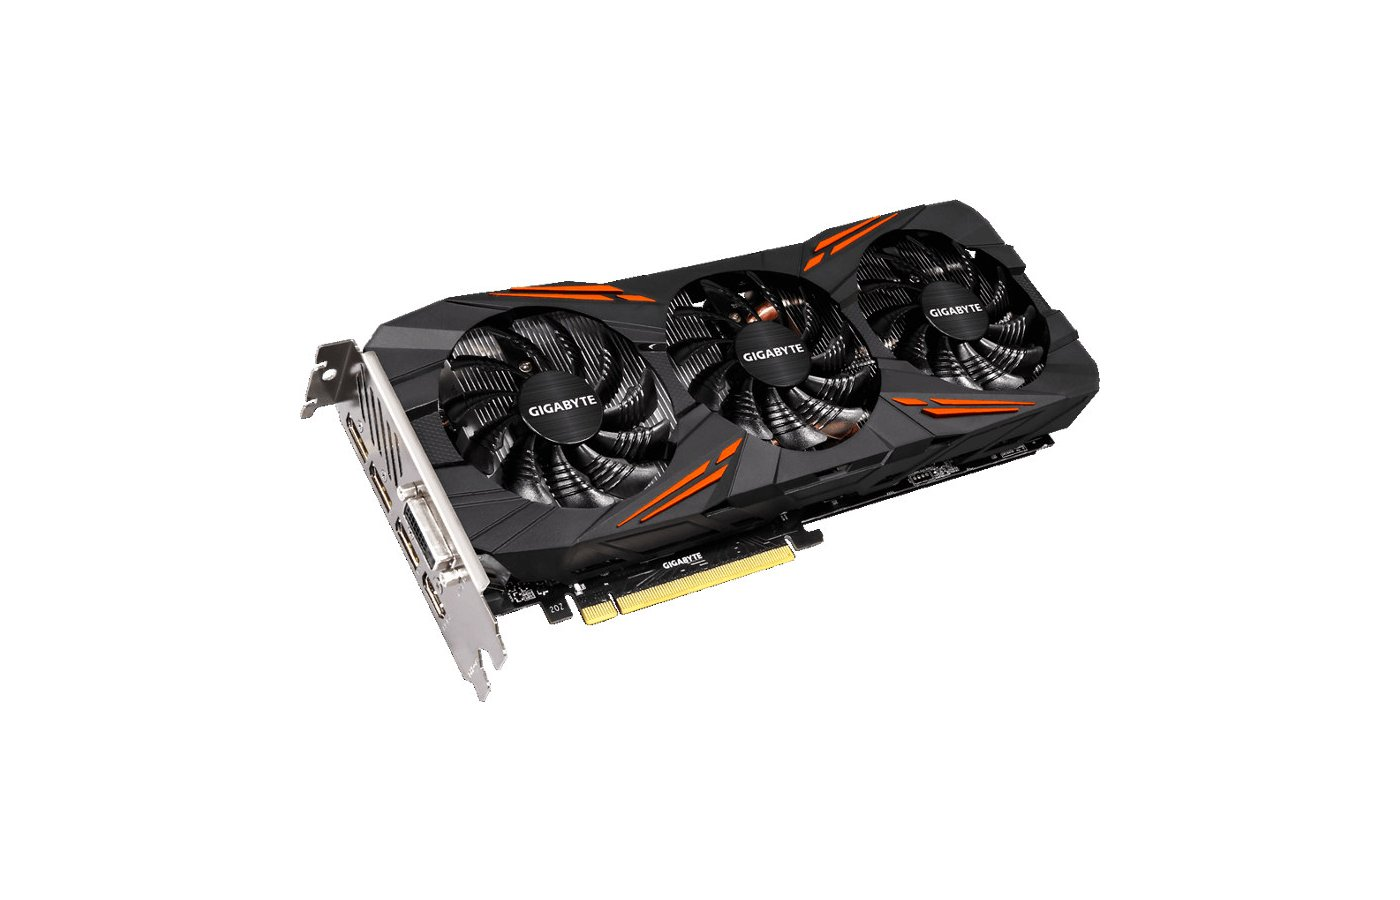 Видеокарта Gigabyte PCI-E GV-N1070G1 GAMING-8GD nVidia GeForce GTX 1070 8192Mb 256bit Ret